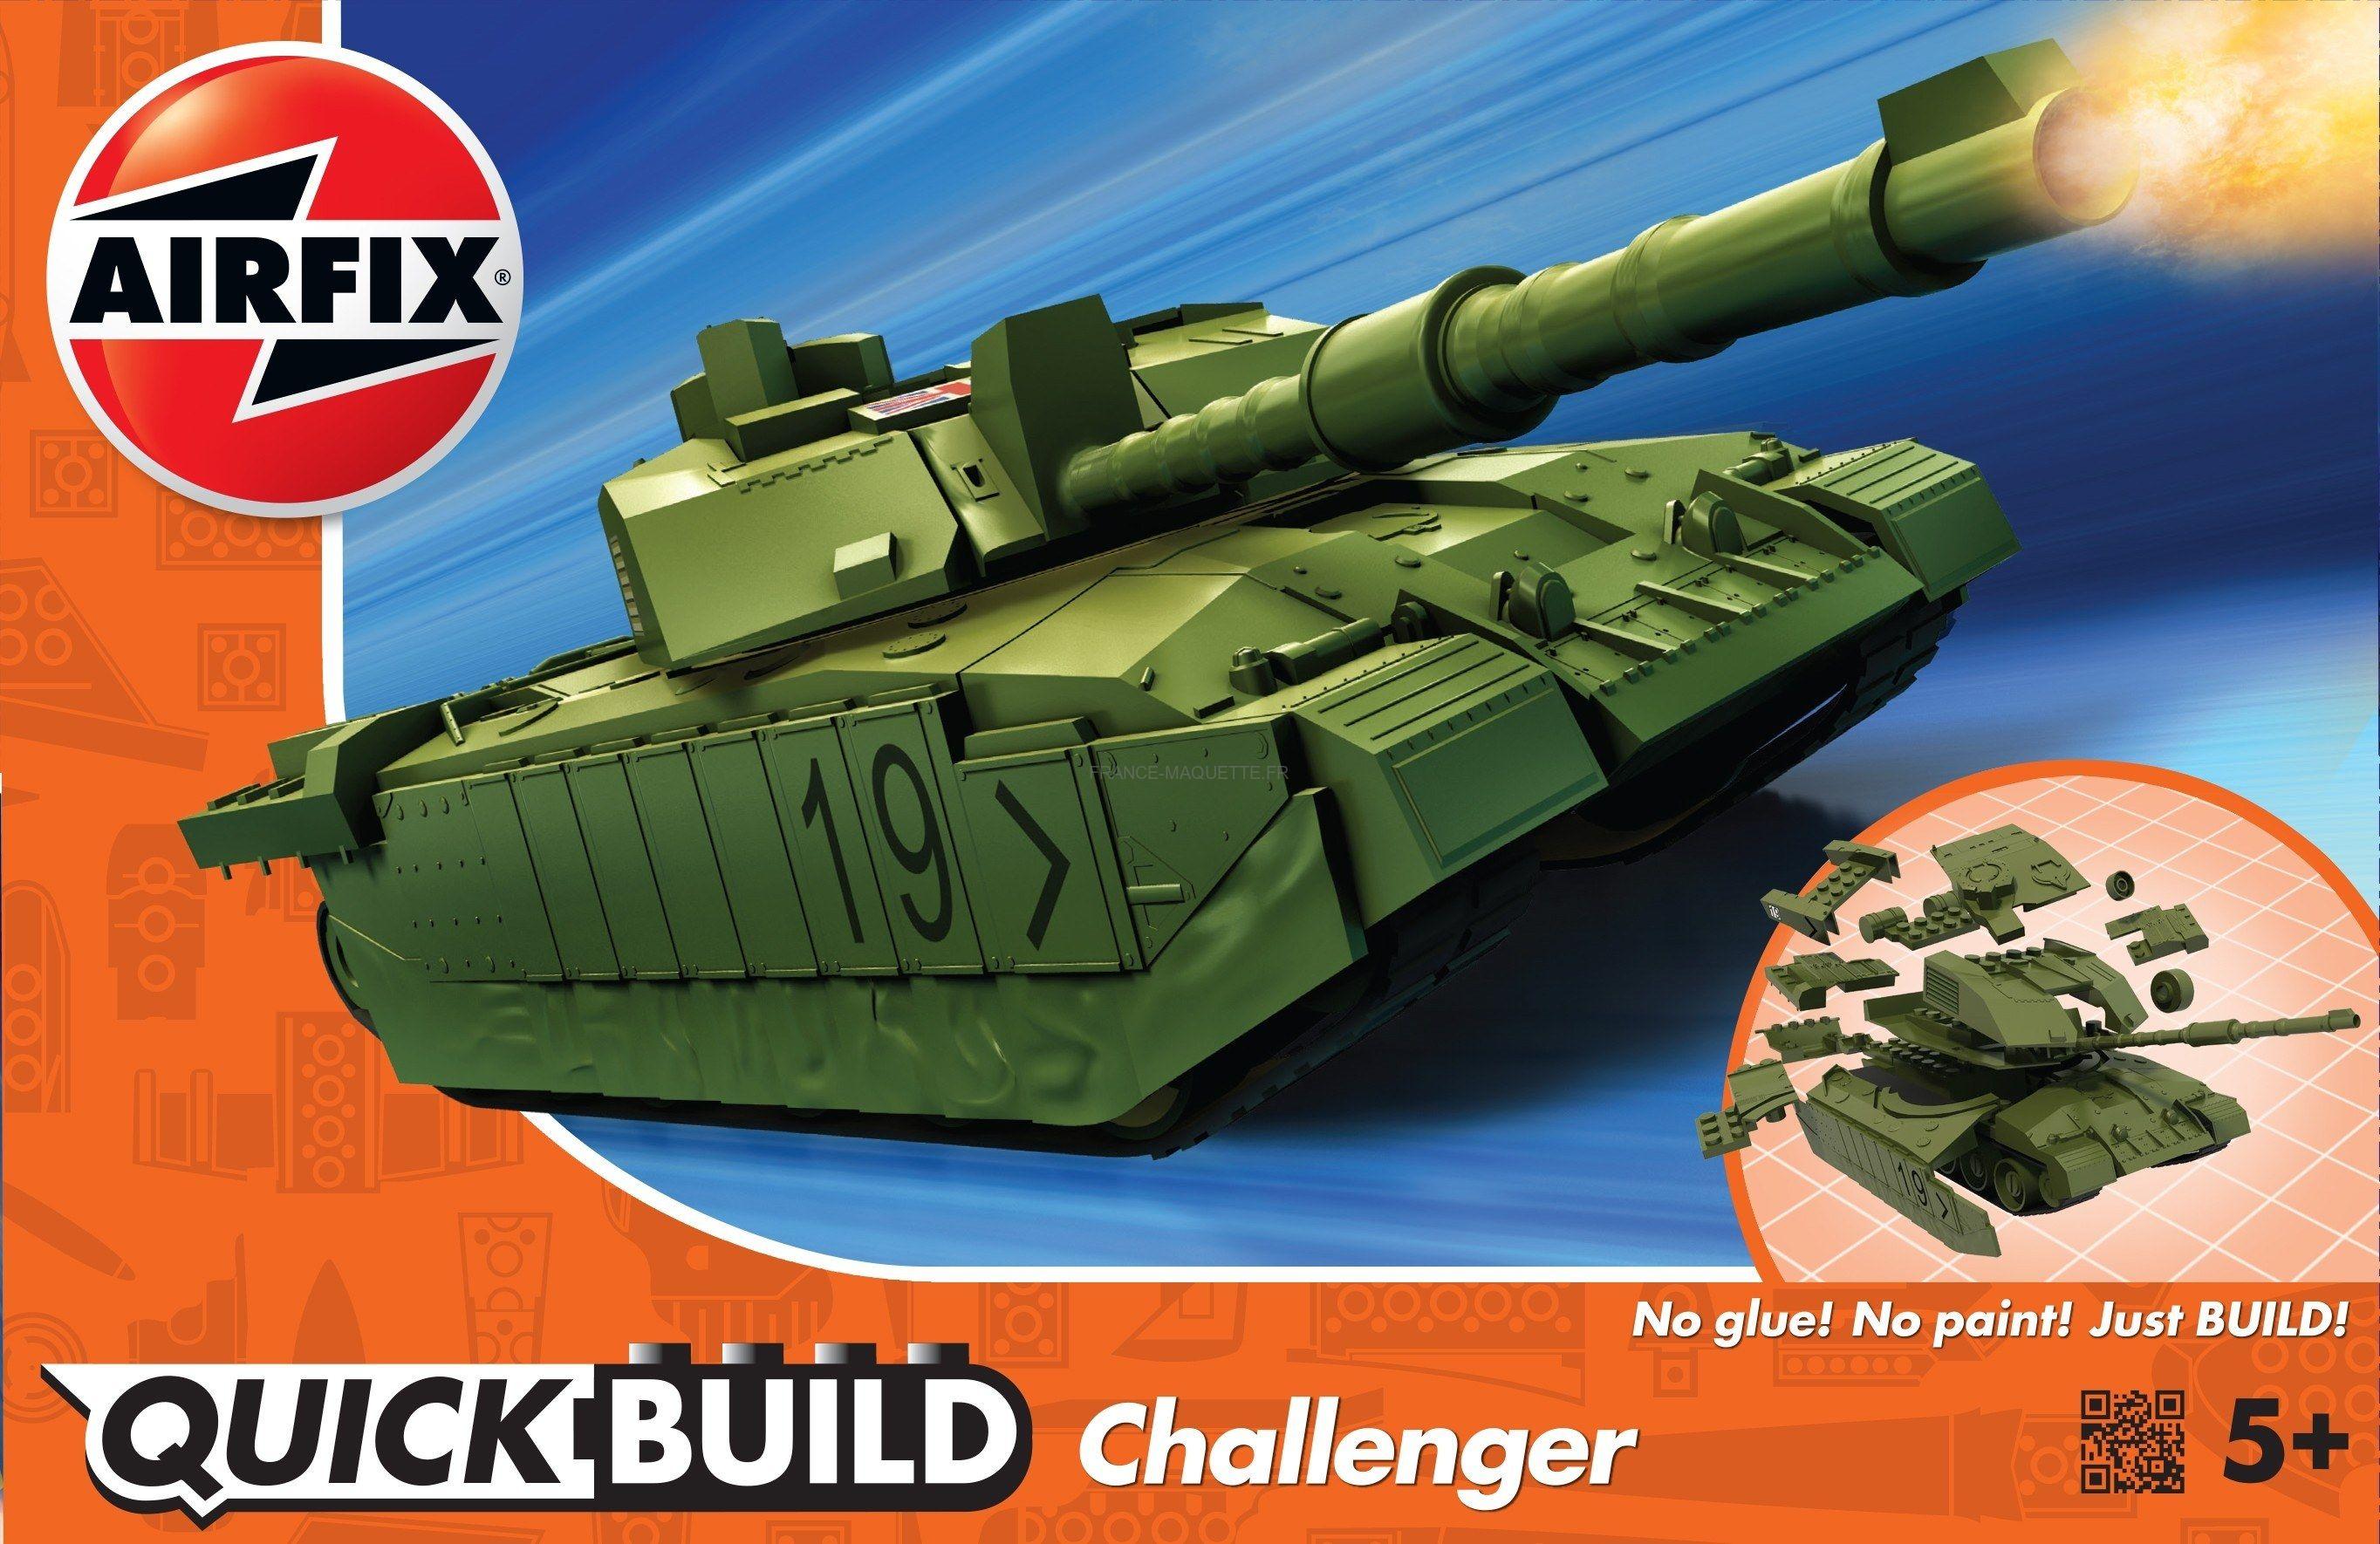 Airfix J6022 Challenger Quick Tank Build SMGqzpUV